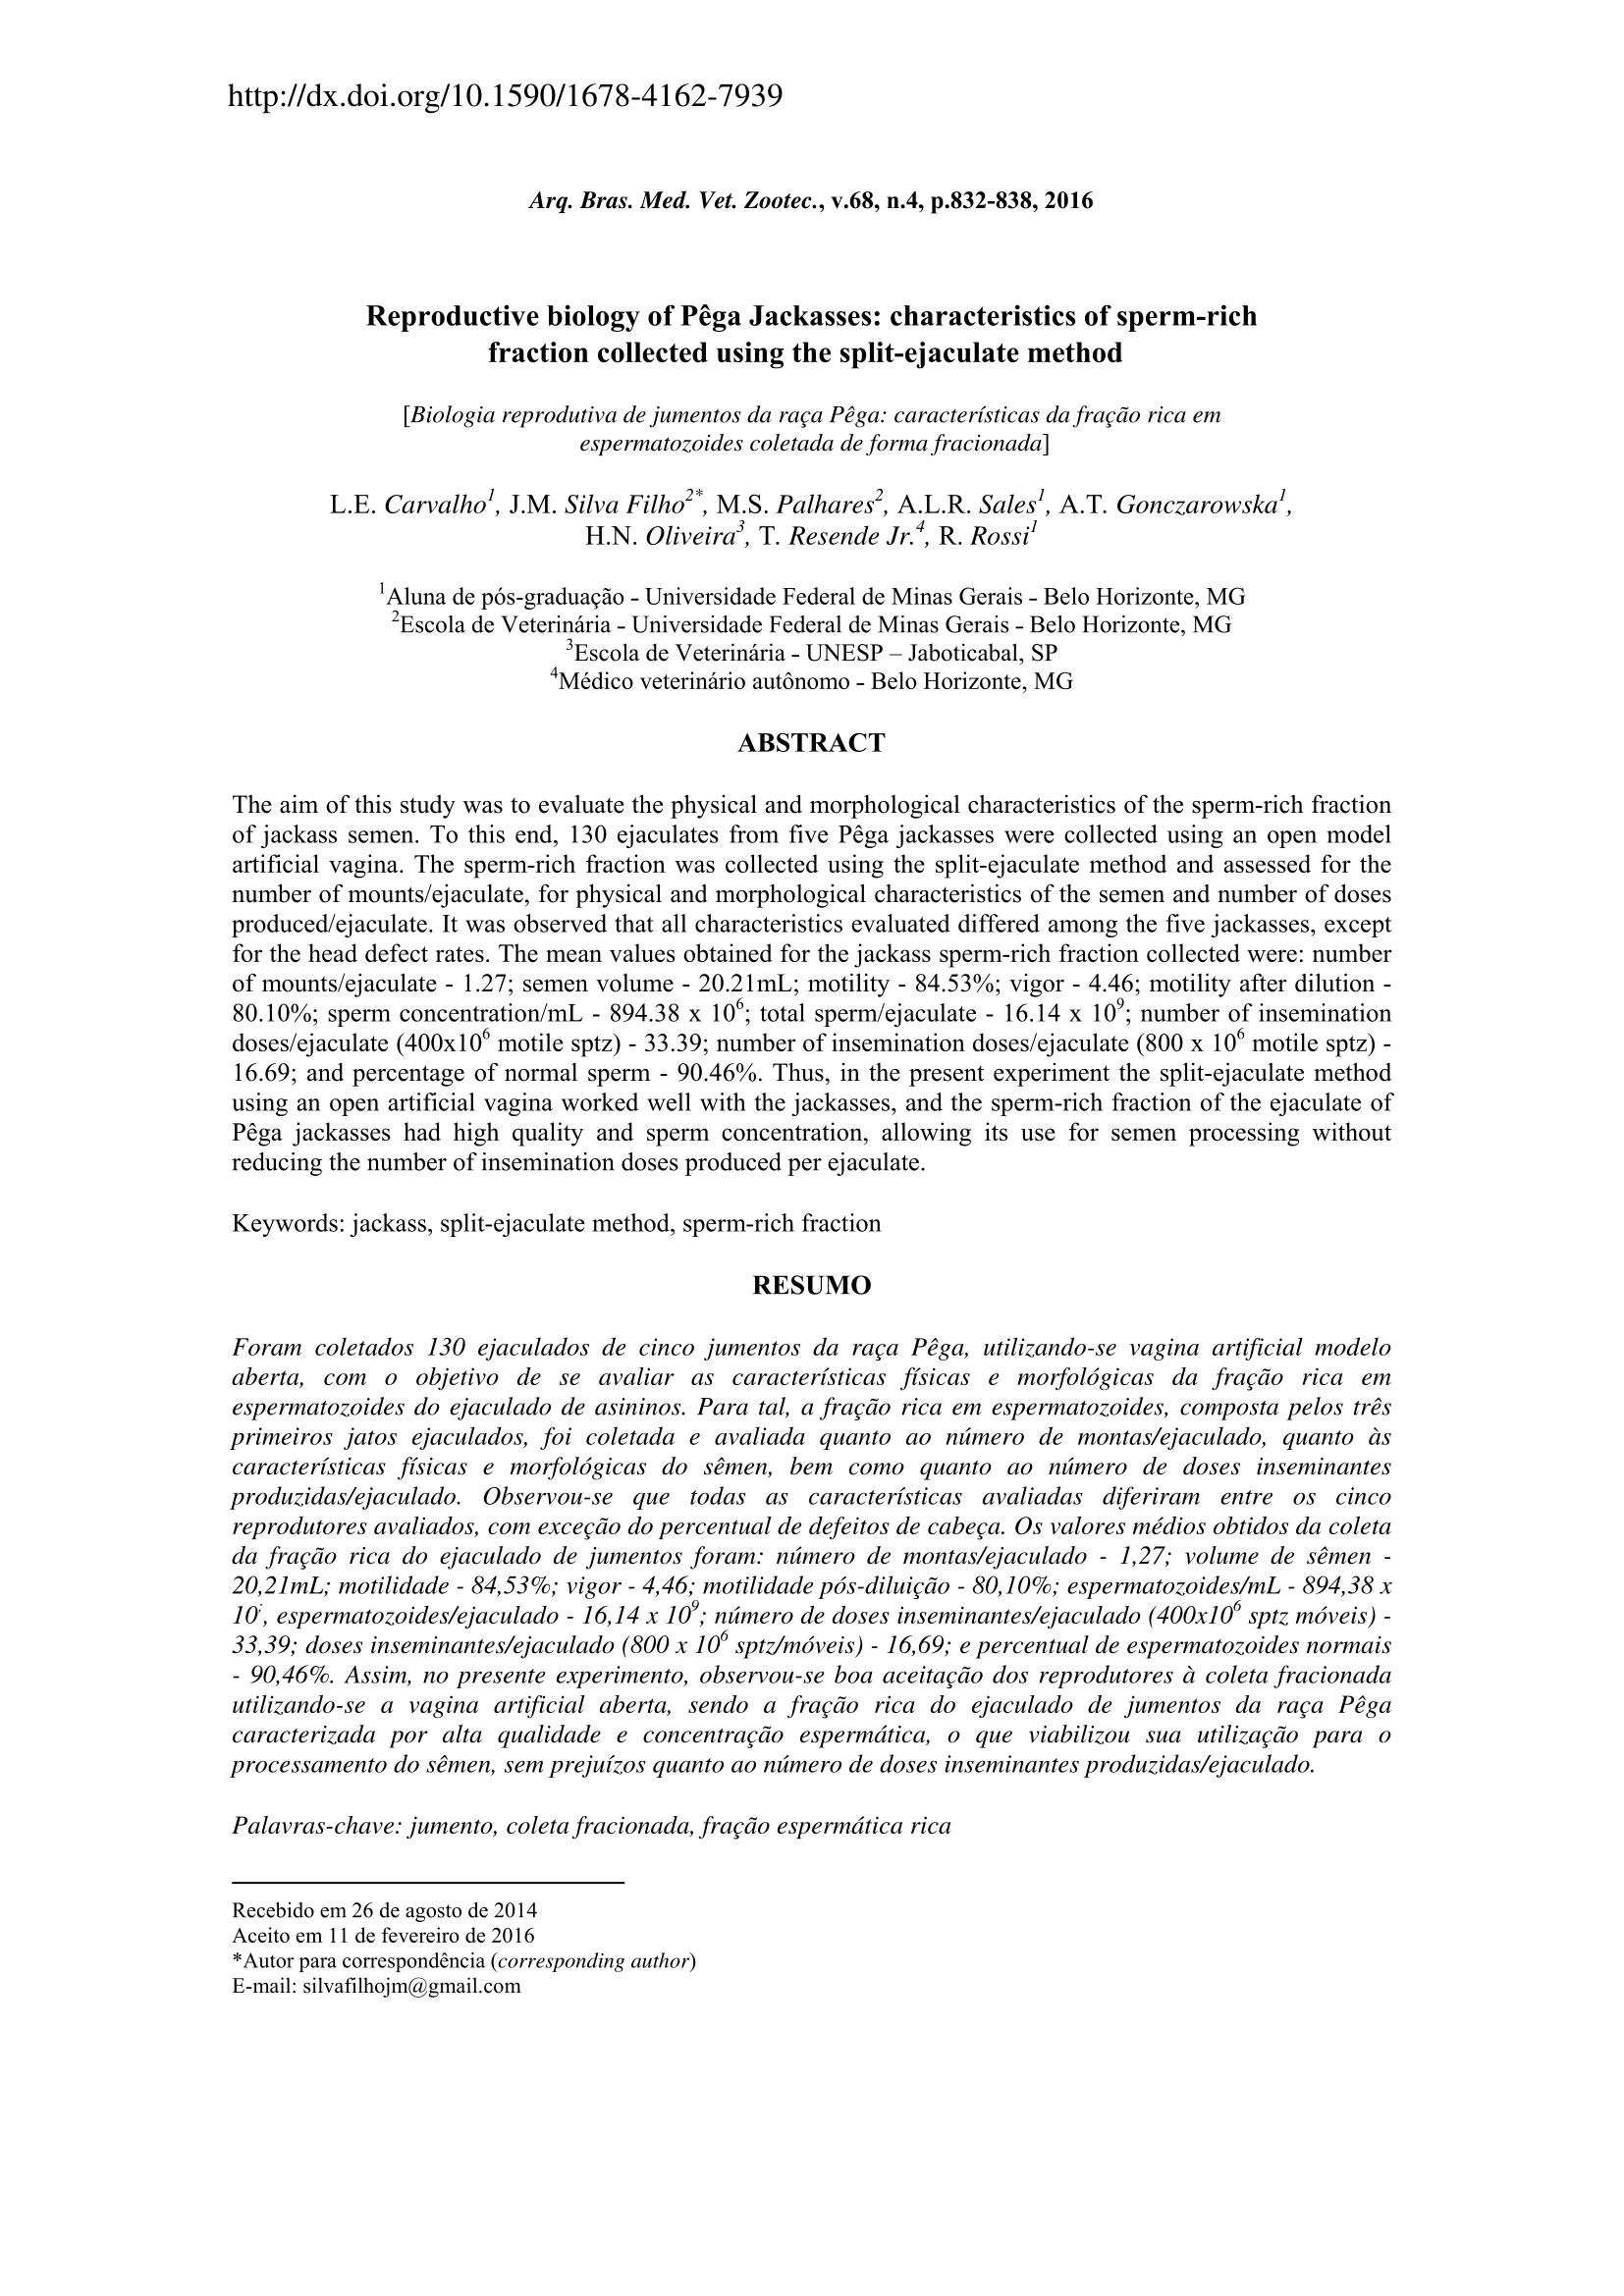 AMA 1-1 (1).png